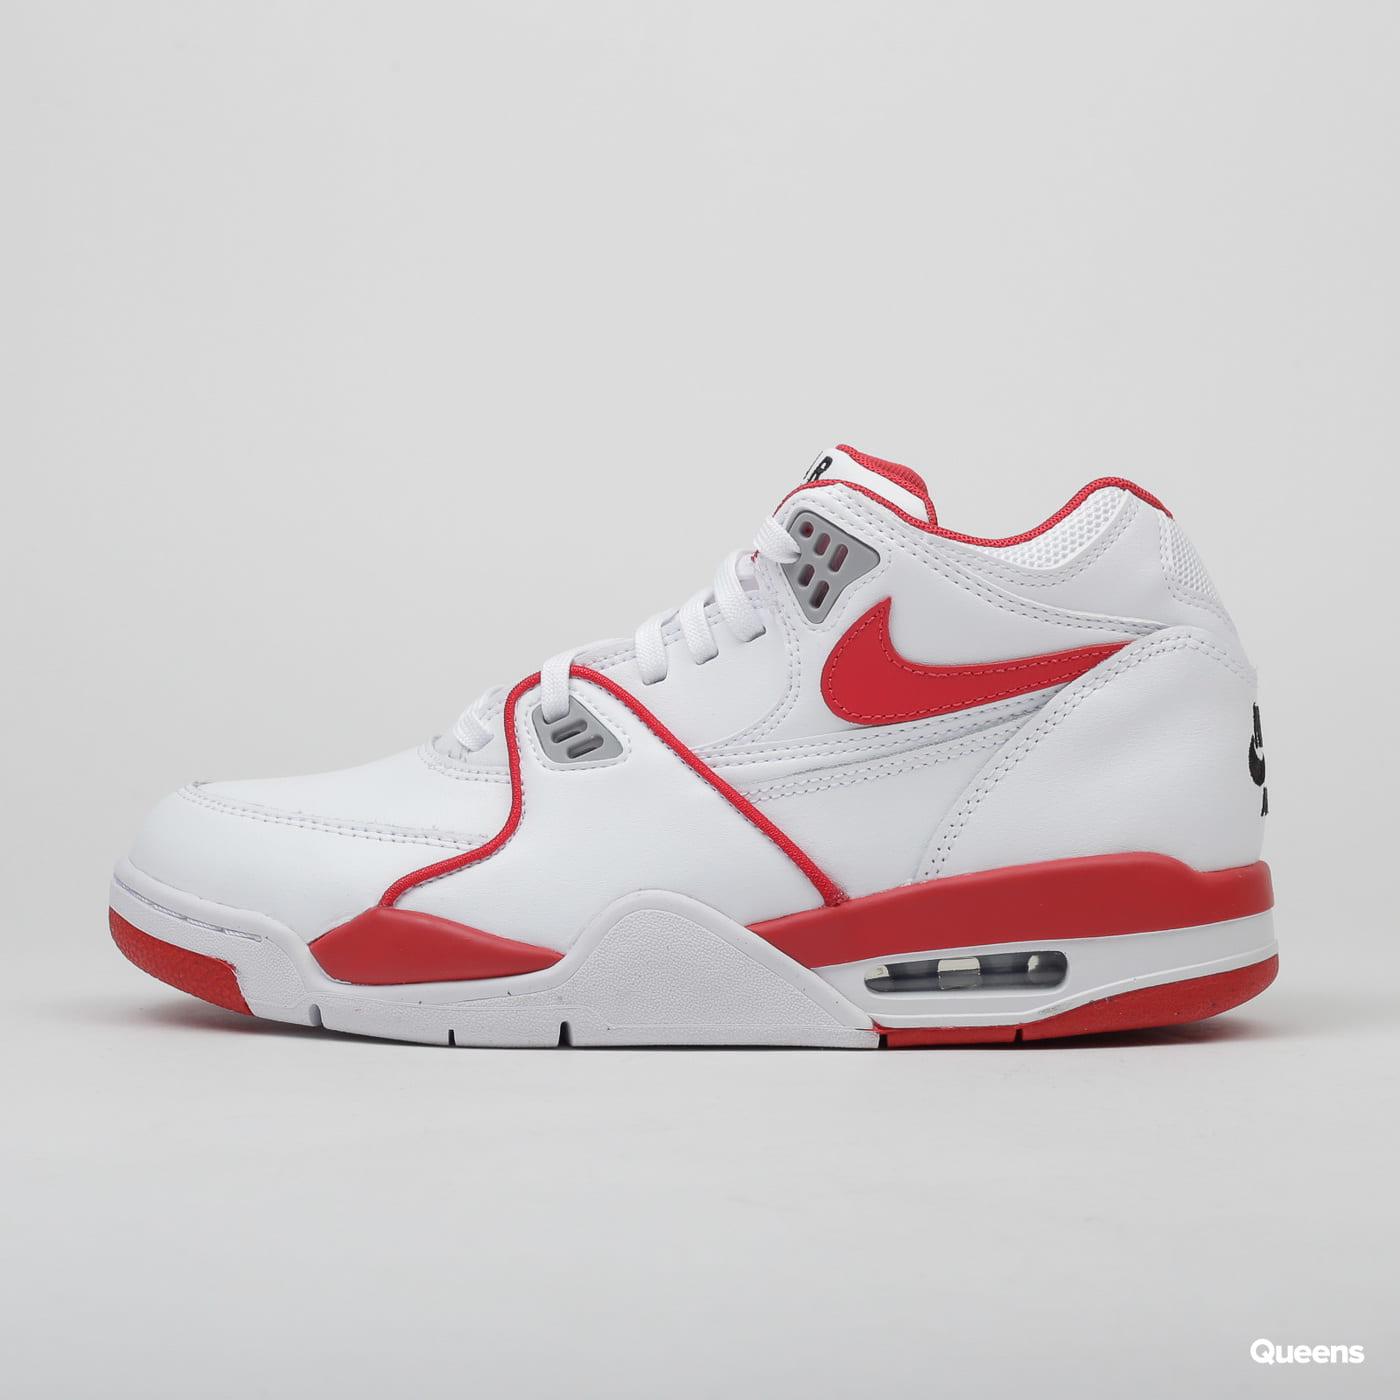 Nike Air Flight 89 LE white / university red - white